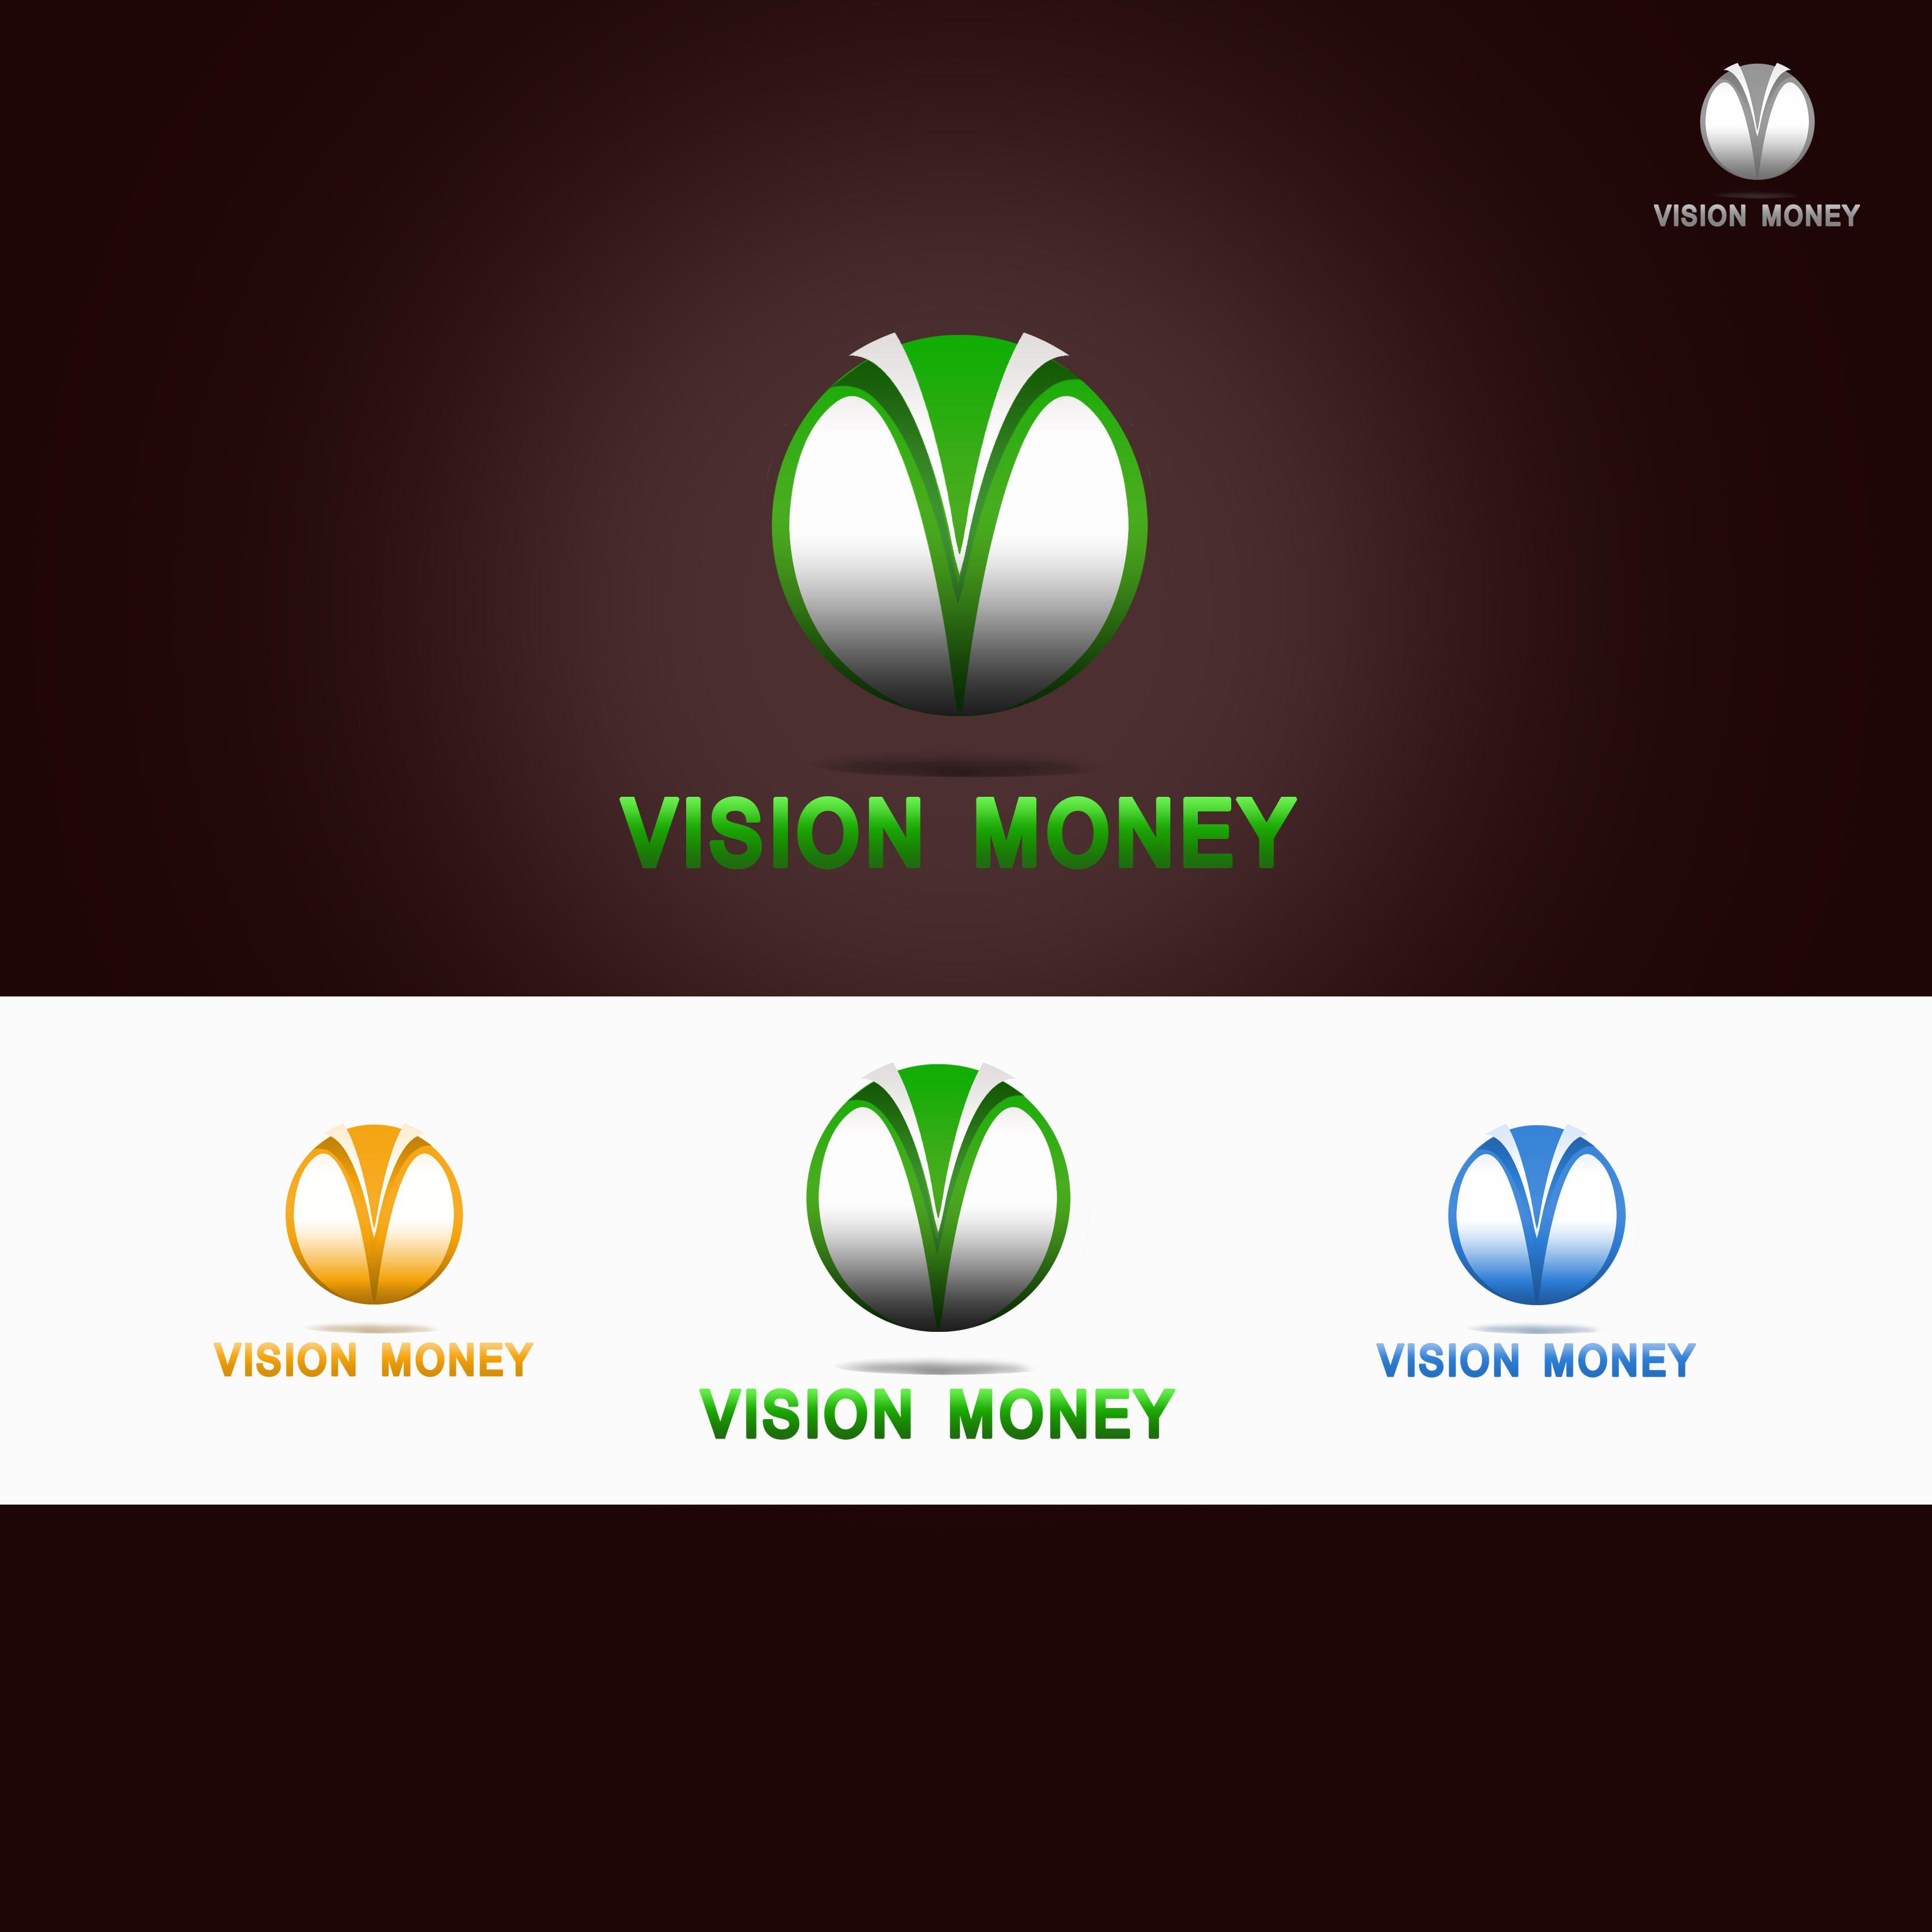 Logo Design by Allan Esclamado - Entry No. 10 in the Logo Design Contest Captivating Logo Design for VISION MONEY.